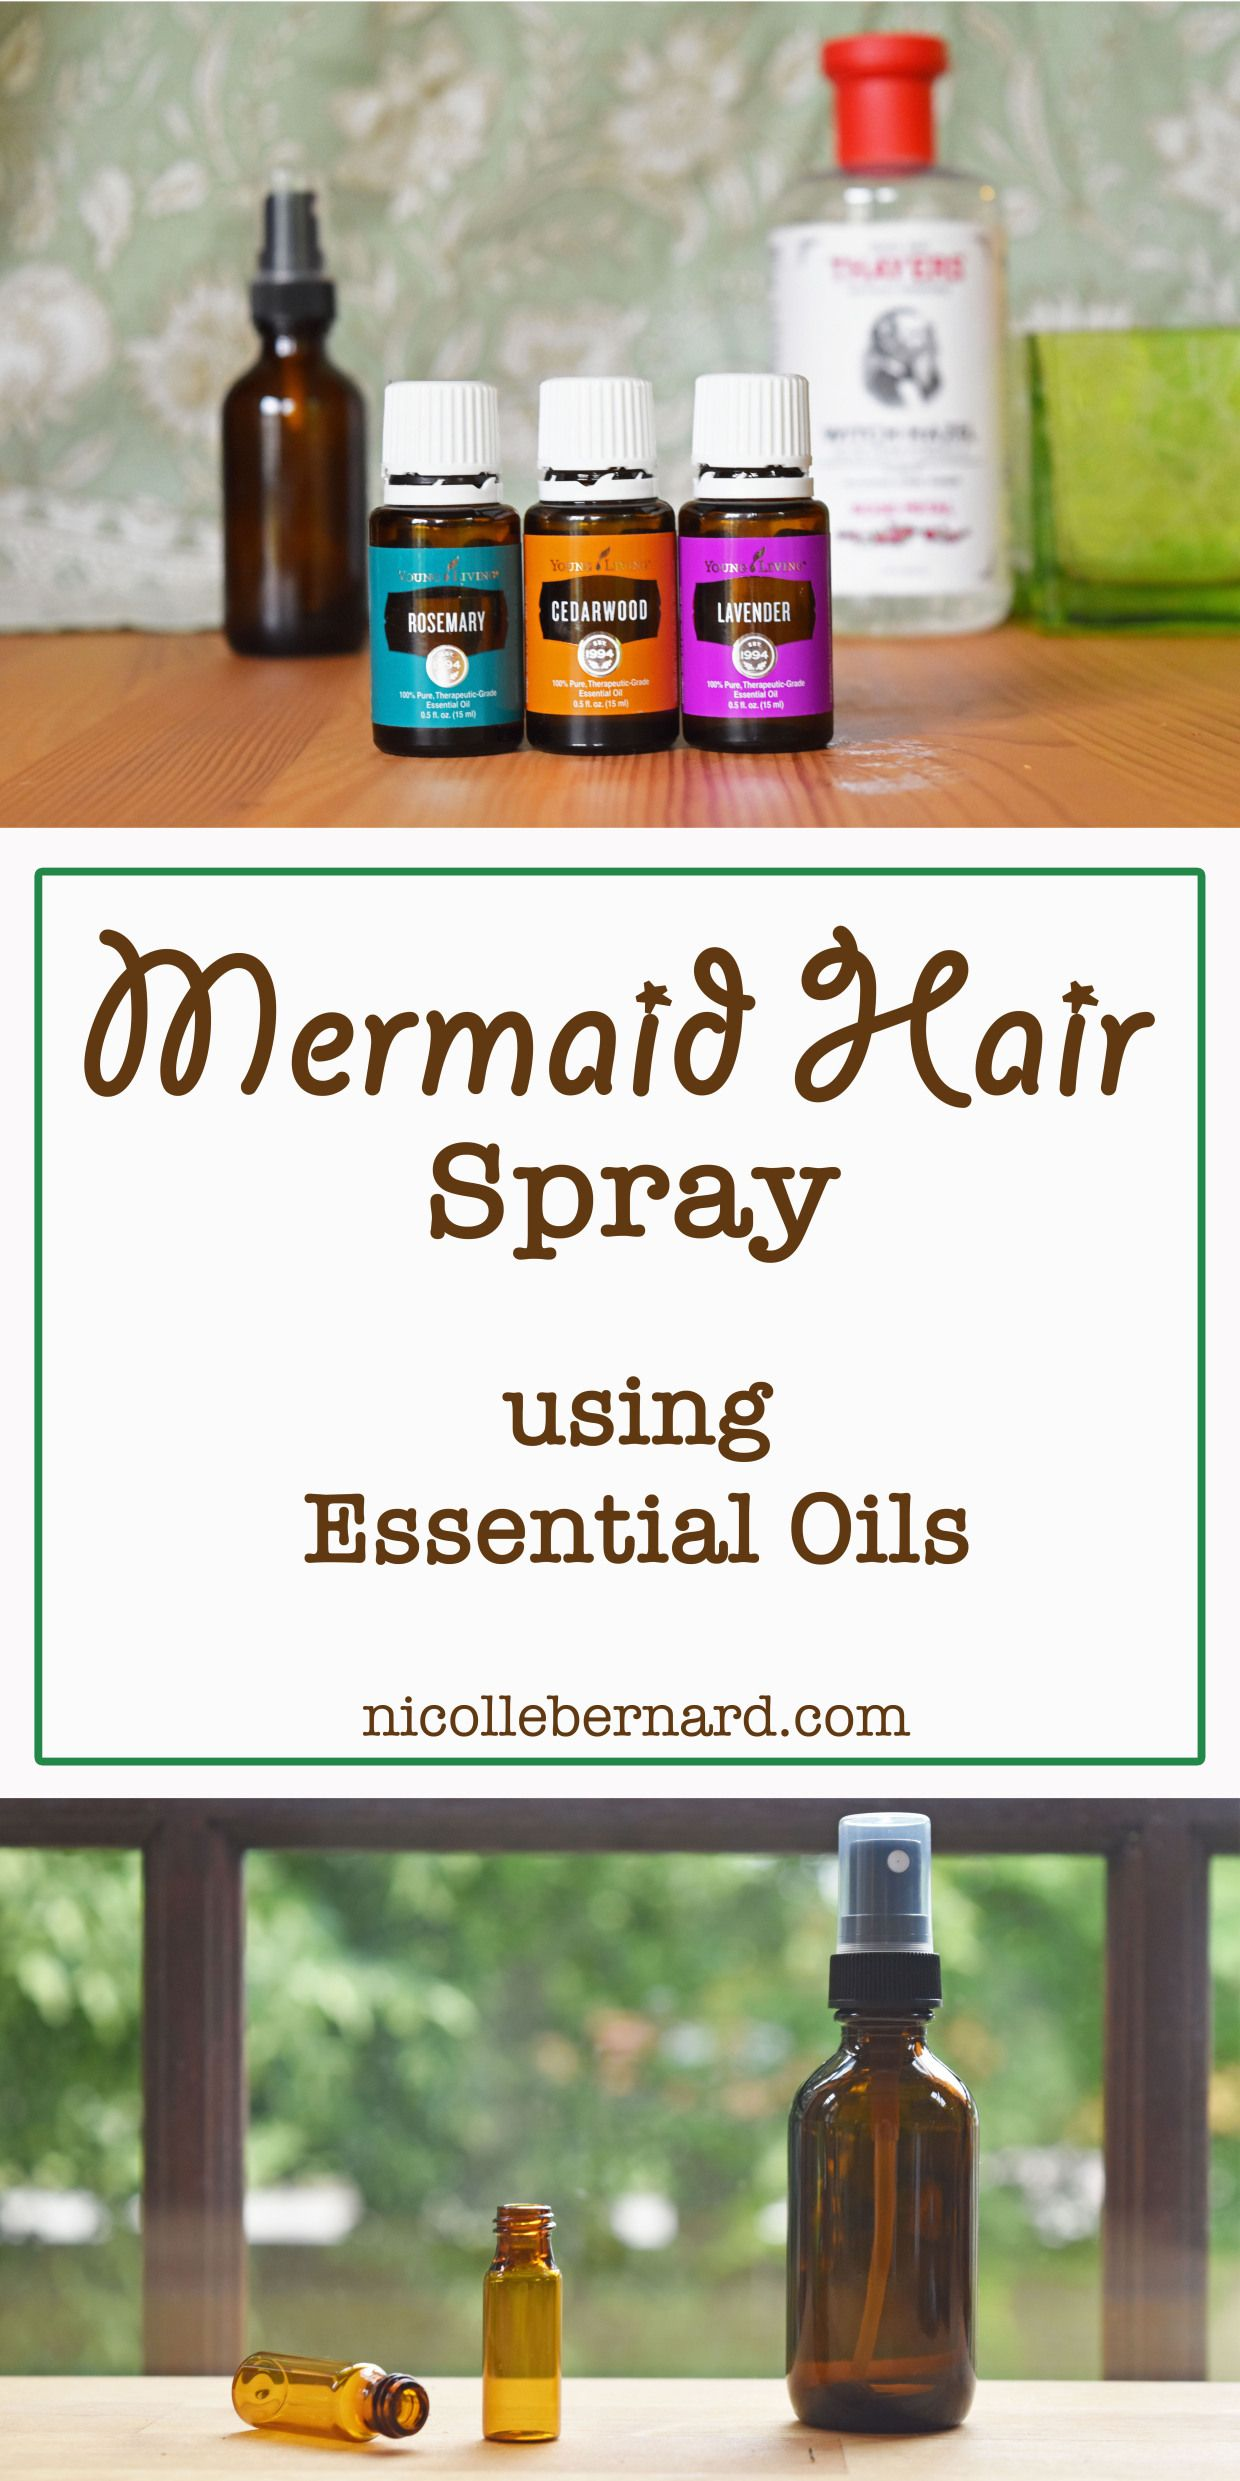 Mermaid Hair Spray Using Essential Oils.jpg Hair growth